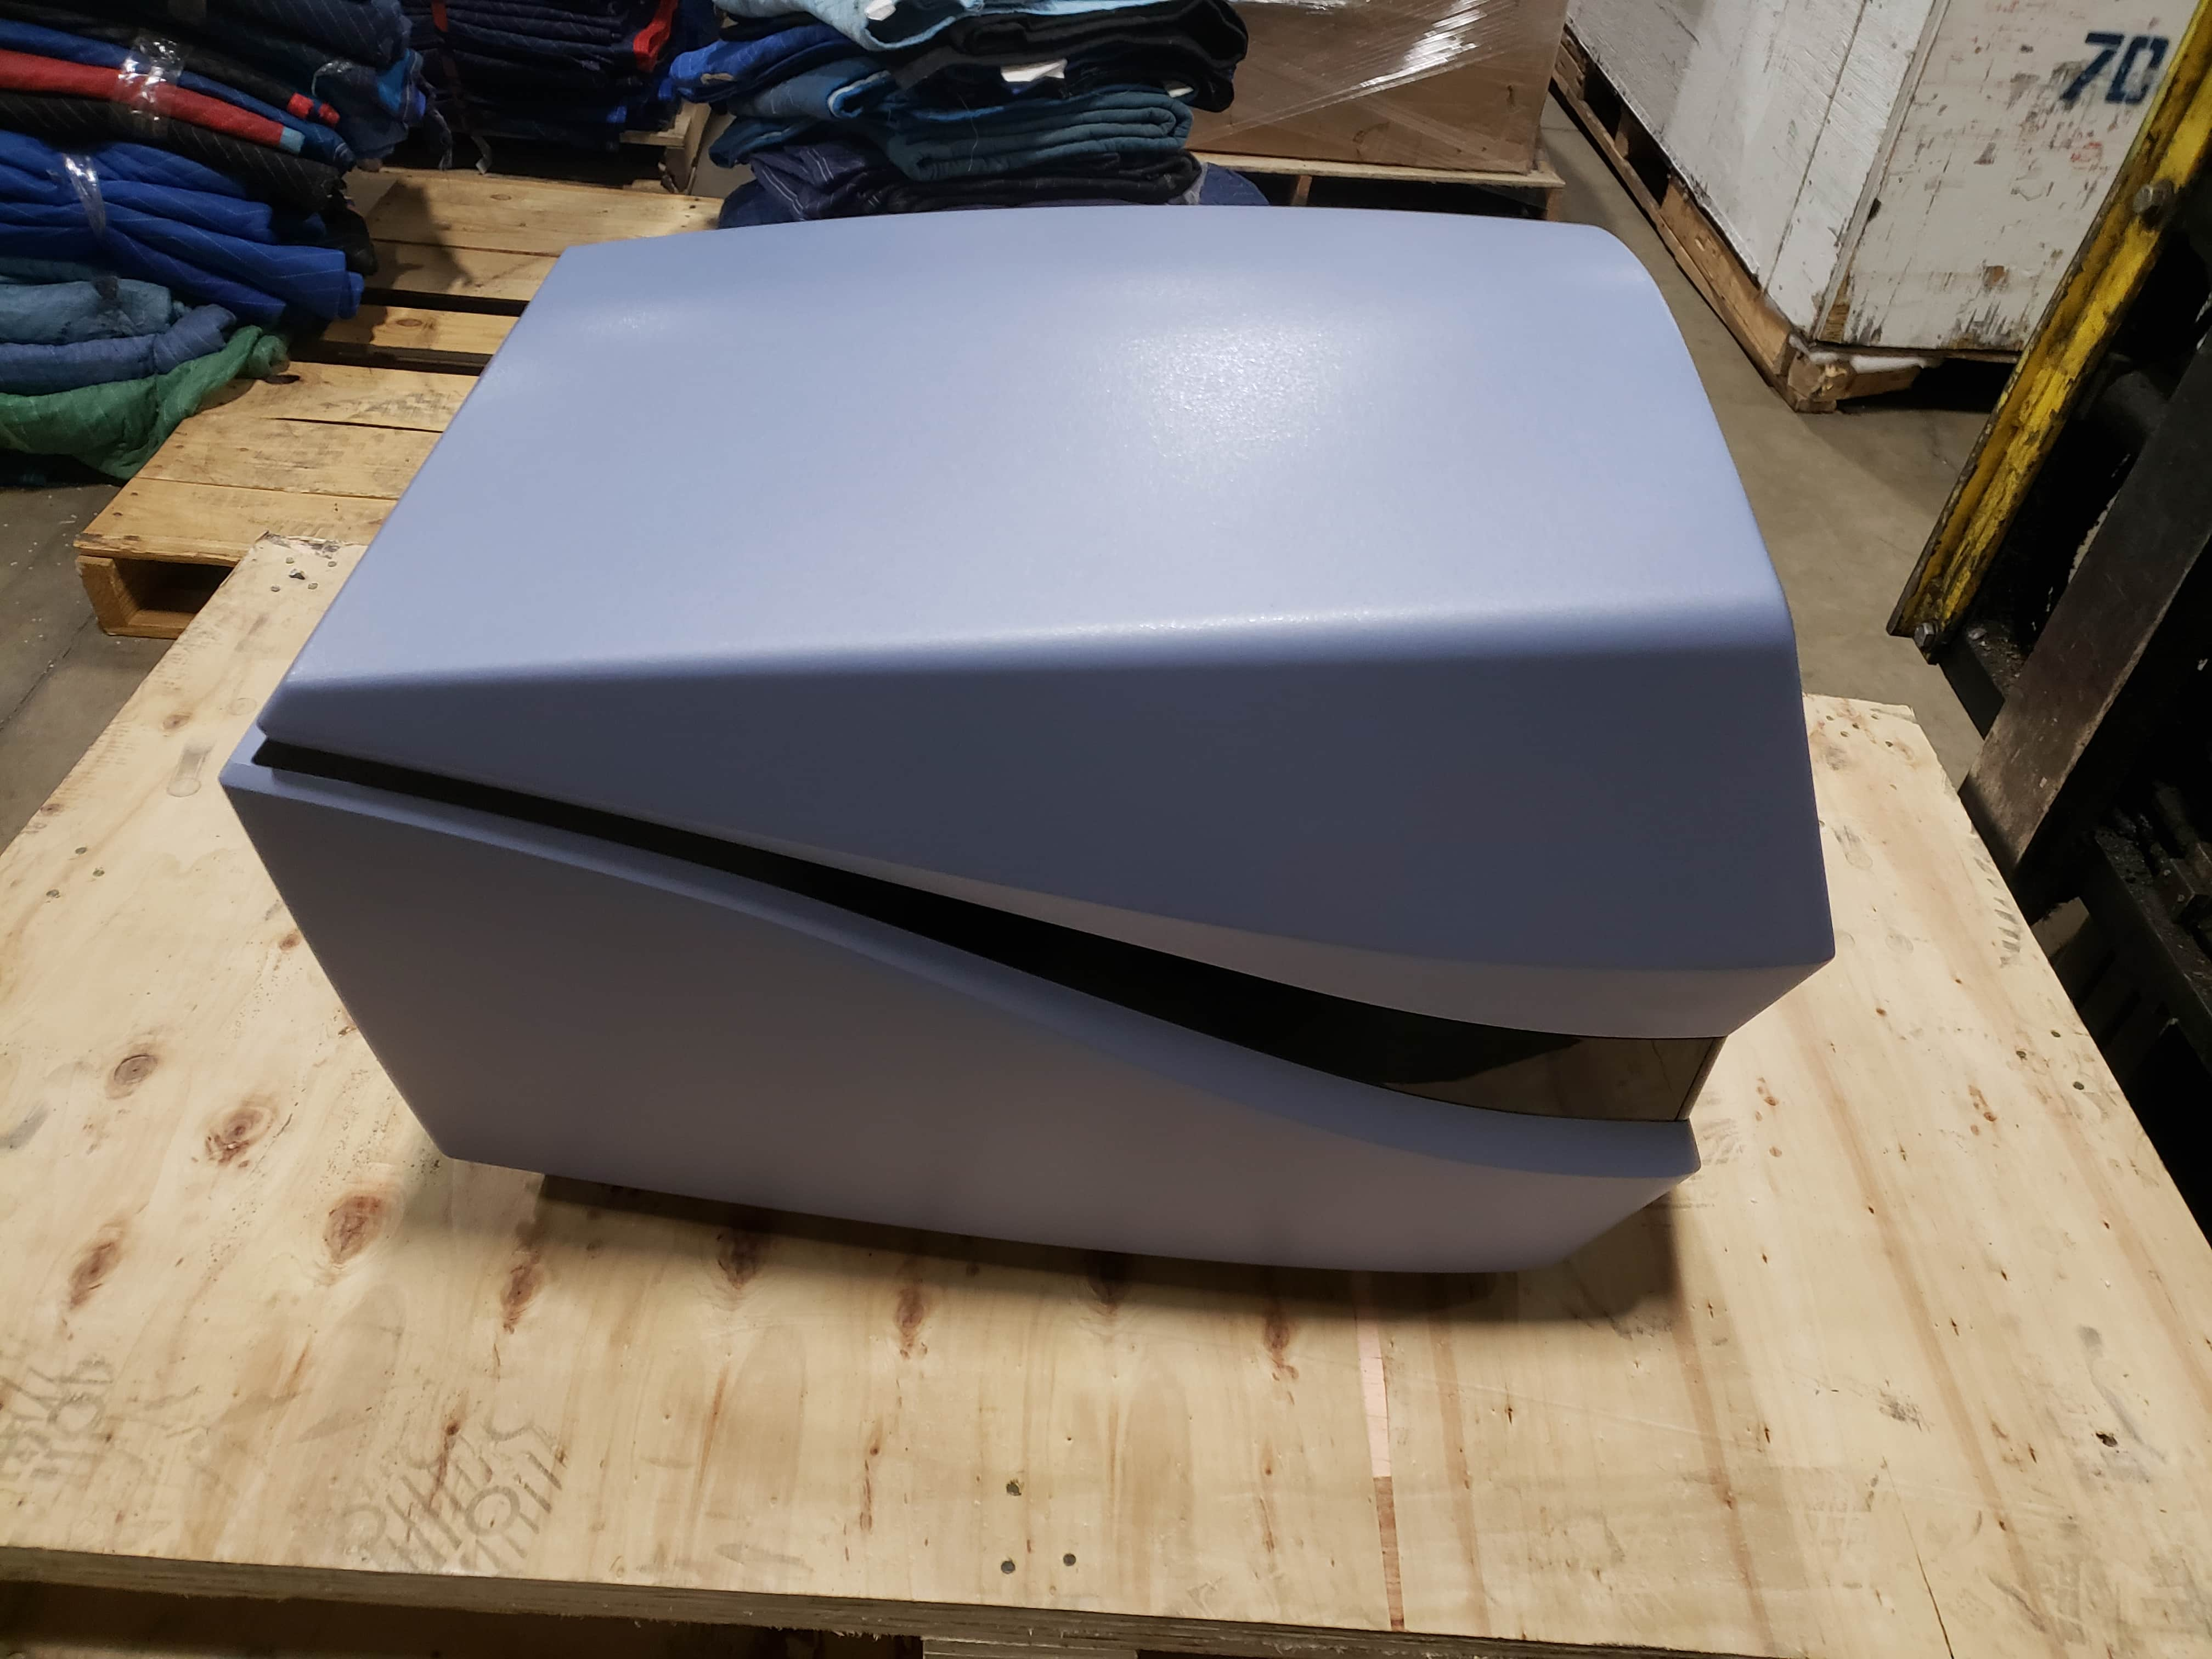 Fluidigm C1 Single-Cell Auto Prep System 2015